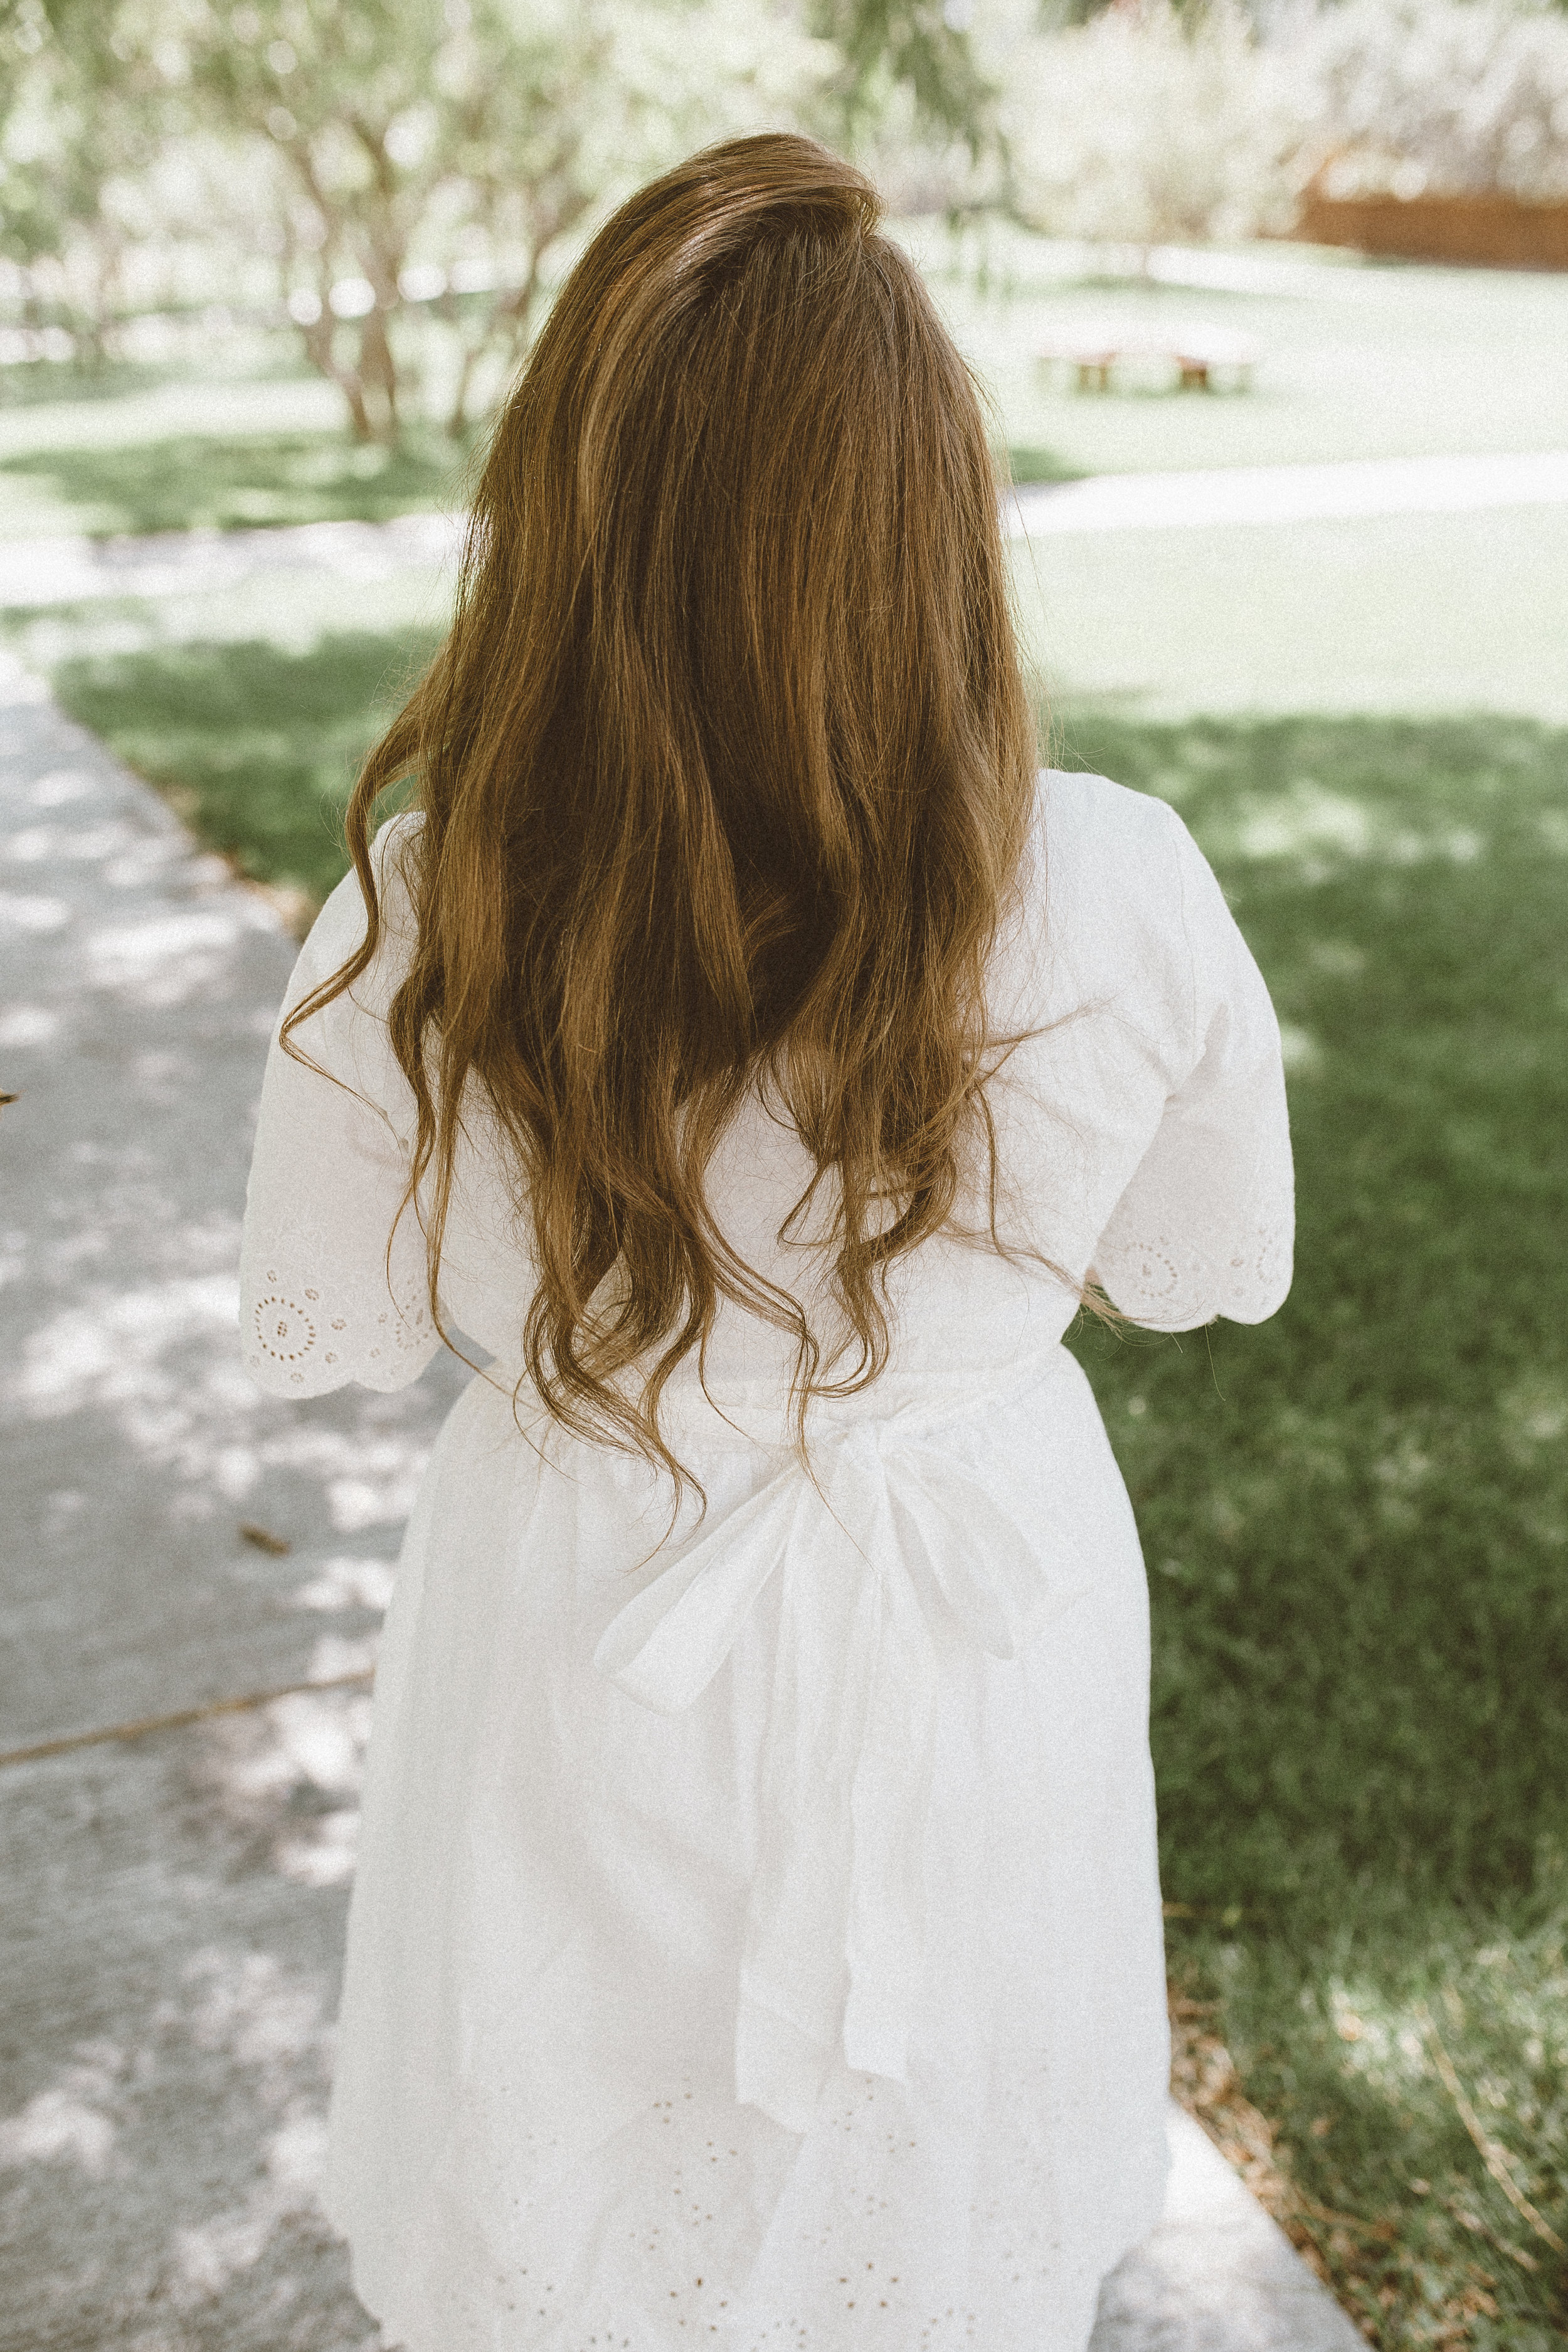 white roolee dress sunday best modest fashion-12.jpg